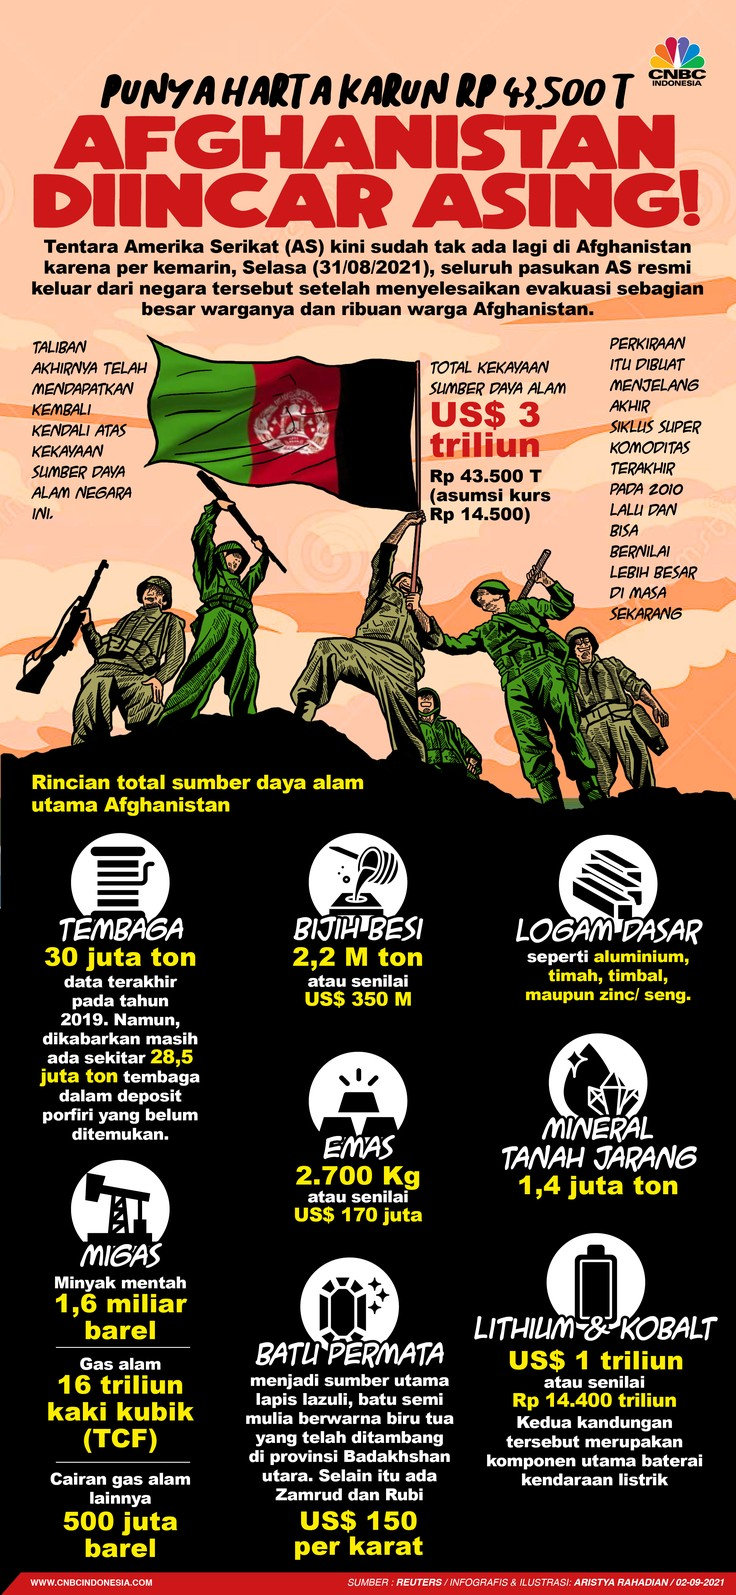 Infografis/Punya Harta Karun Rp 43.500 T, Afghanistan diincar Asing!/Aristya Rahadian